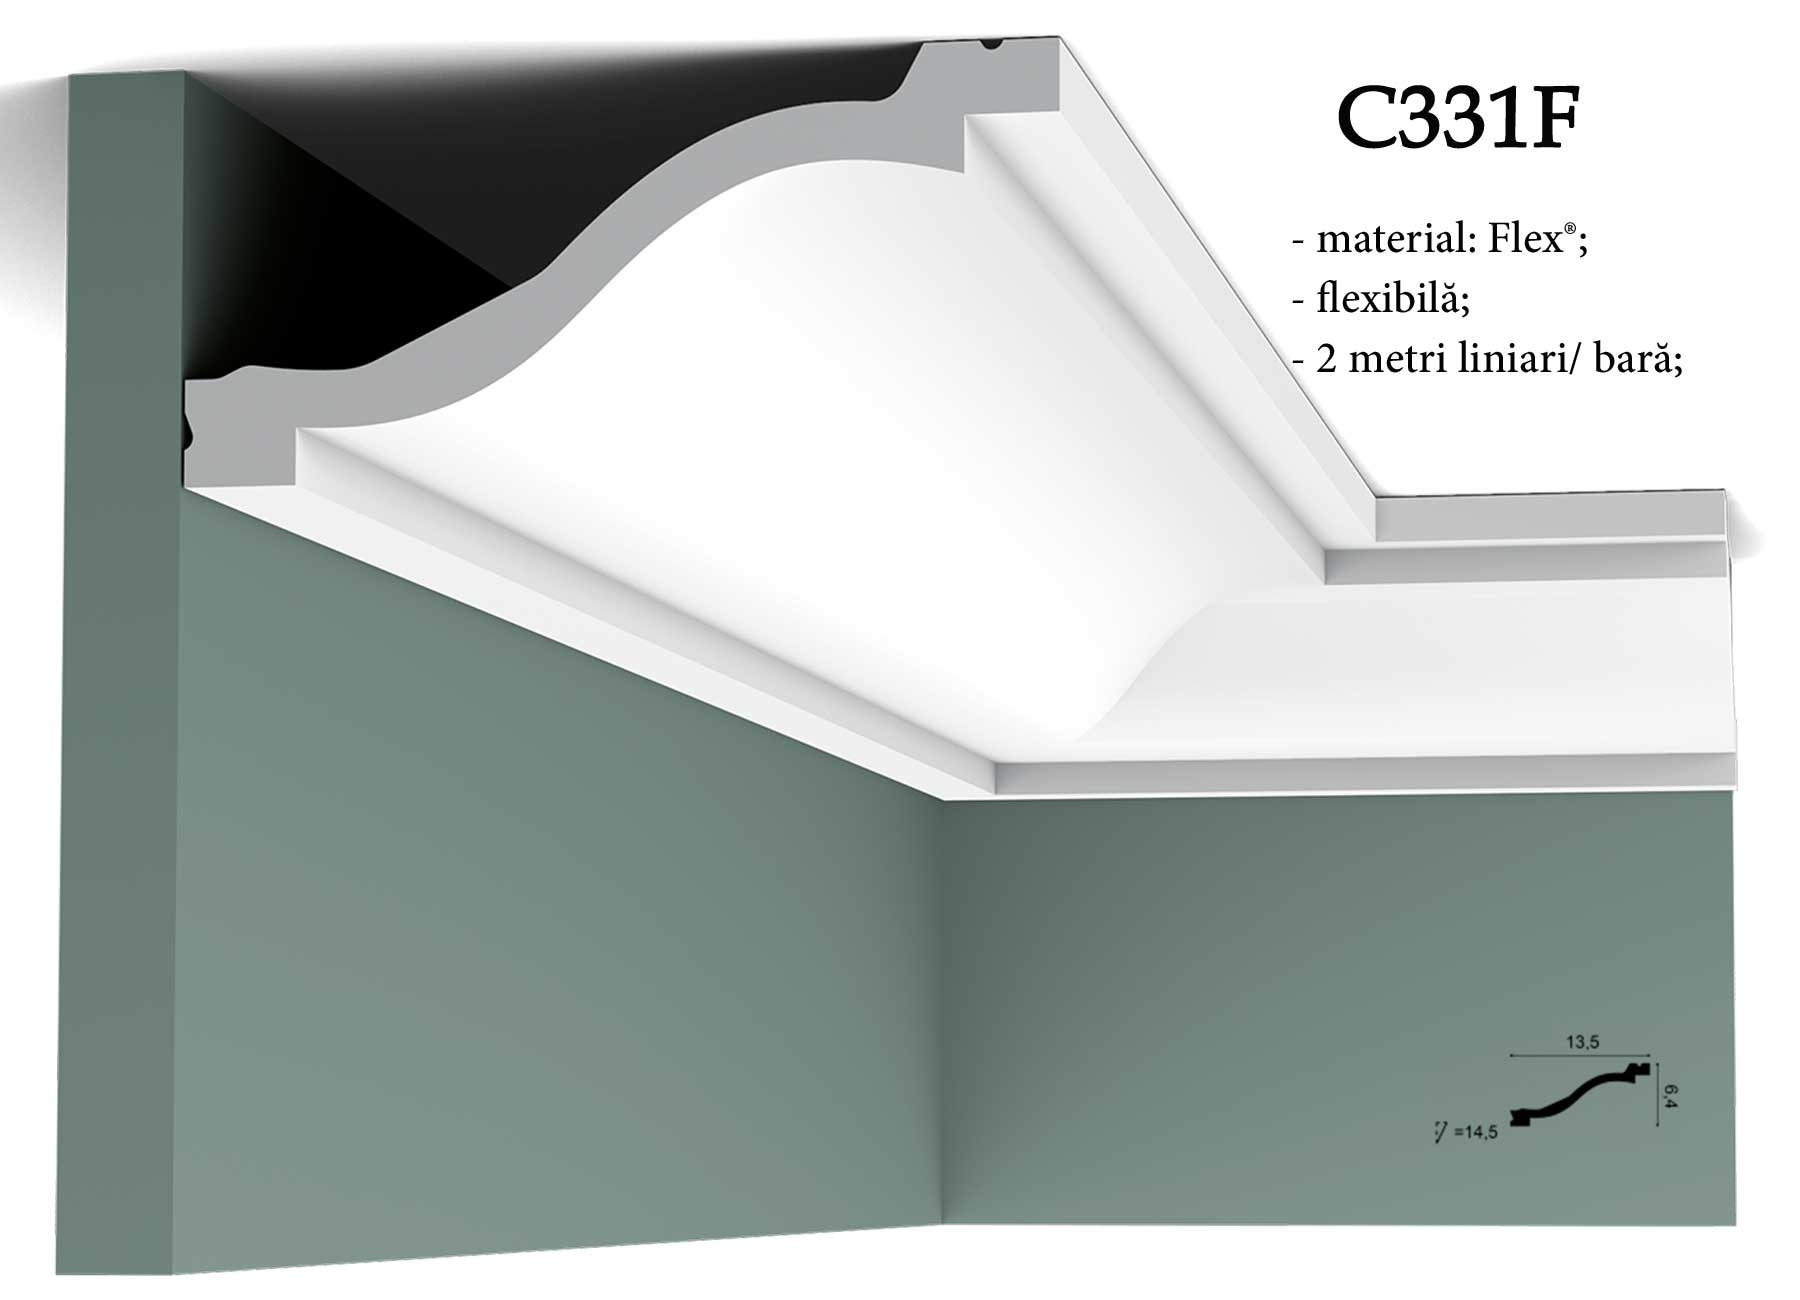 Cornisa flexibila pentru tavan Orac Decor C331F